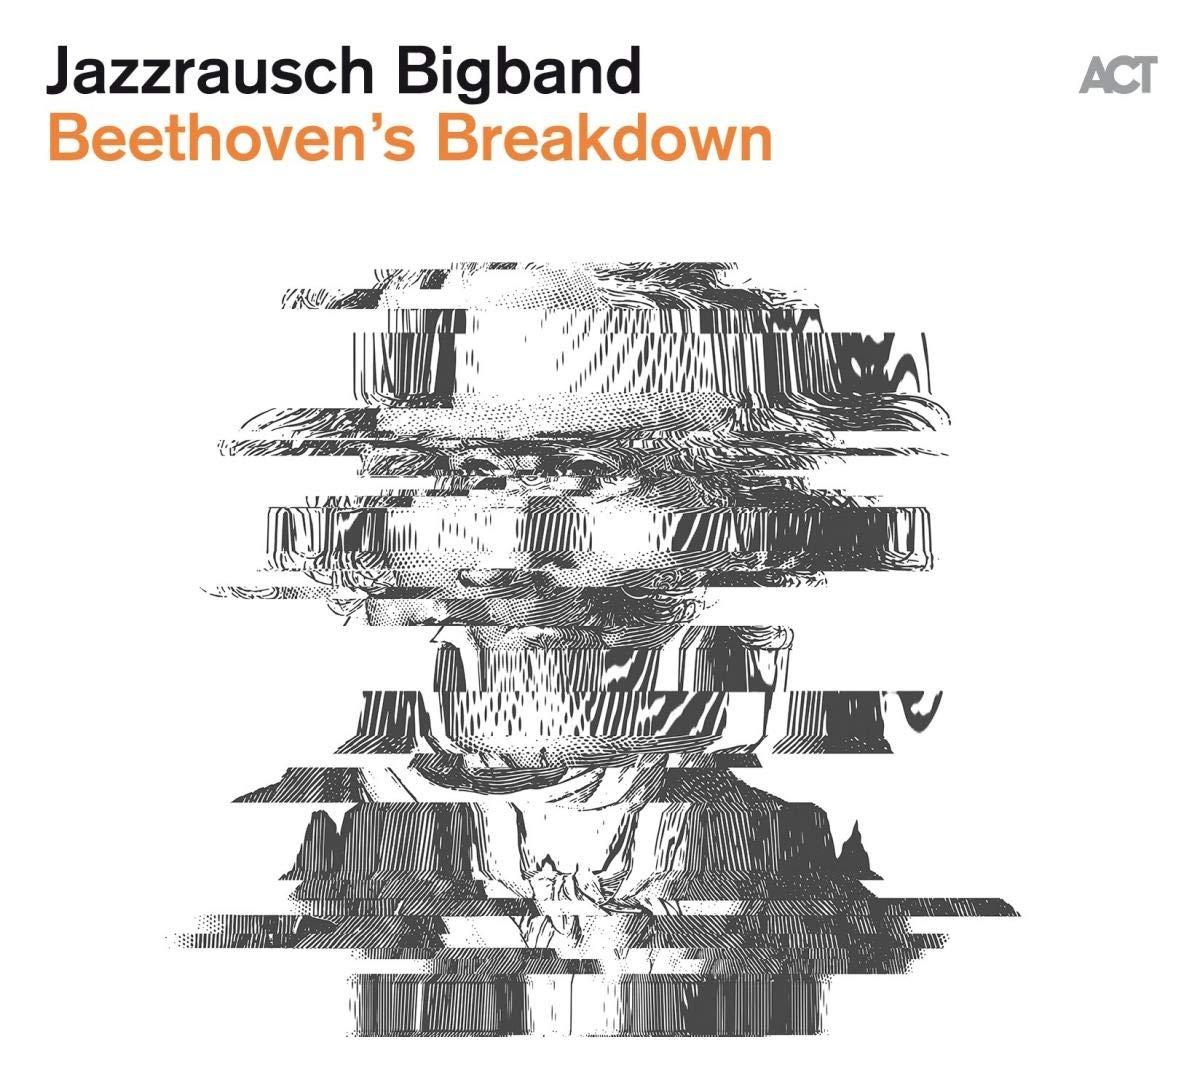 Jazzrausch Bigband-Beethovens Breakdown-CD-FLAC-2020-THEVOiD